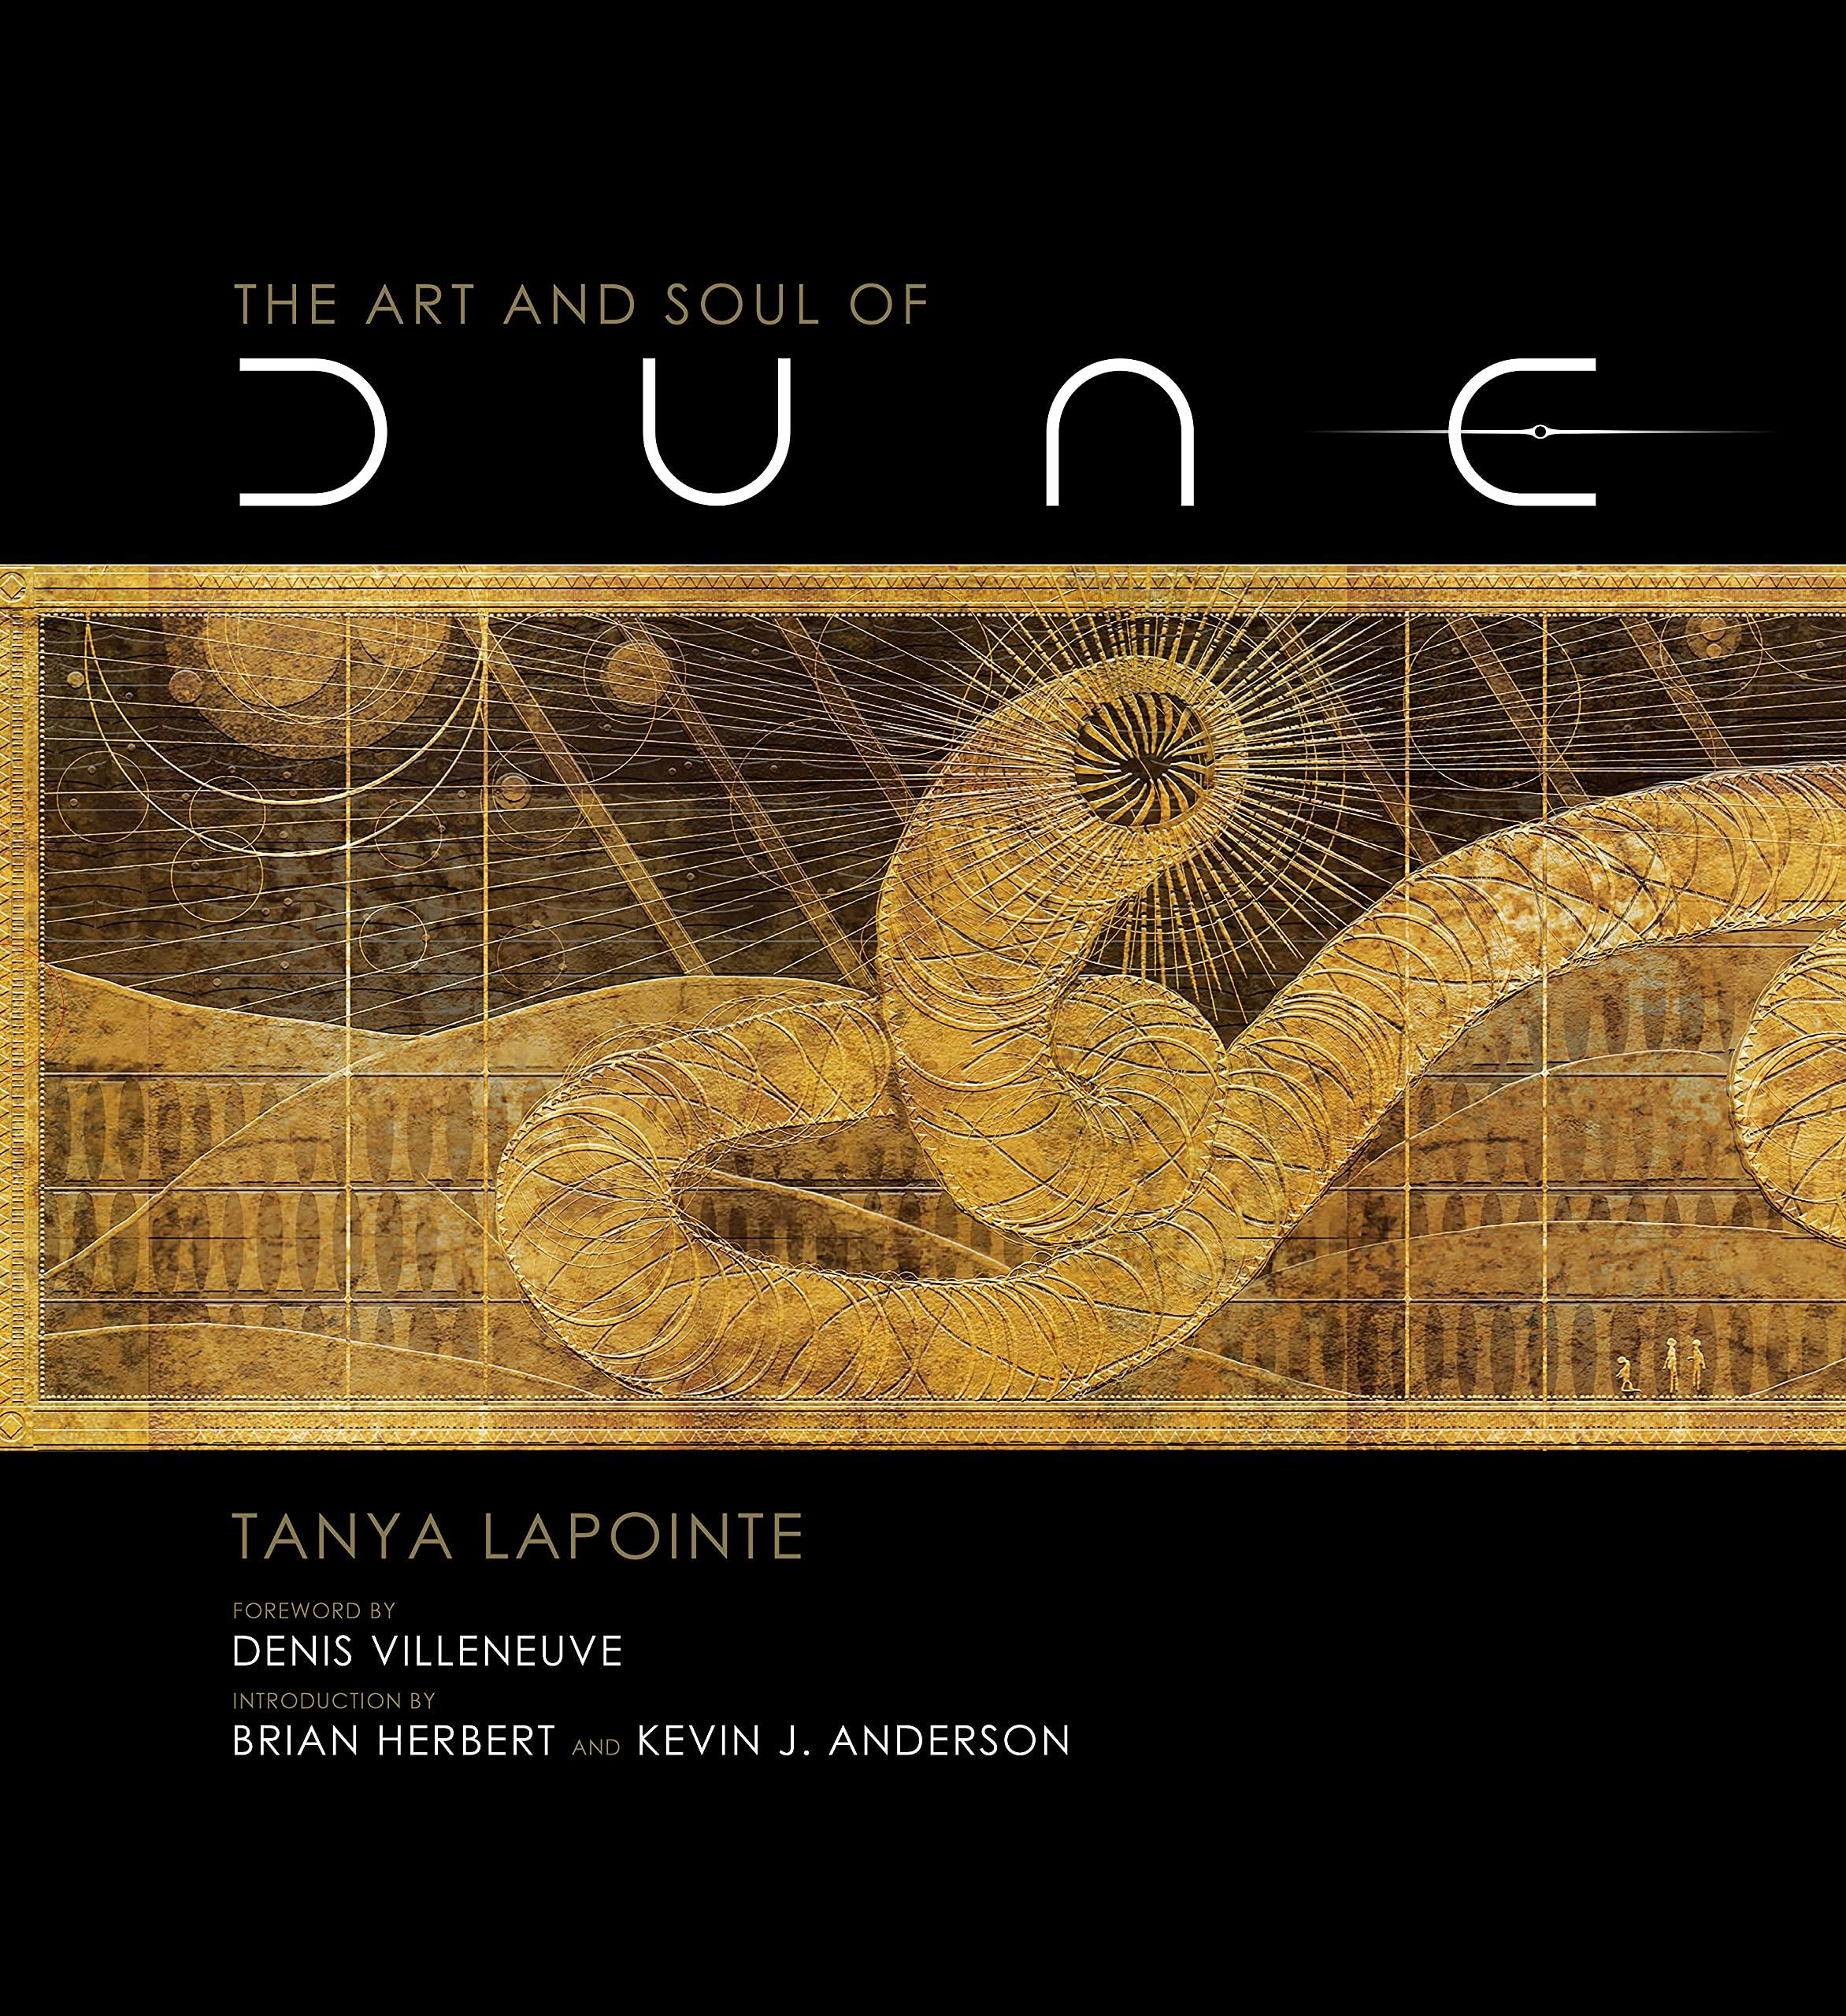 Dune (La saga) - Página 15 91JsIc6tMkL